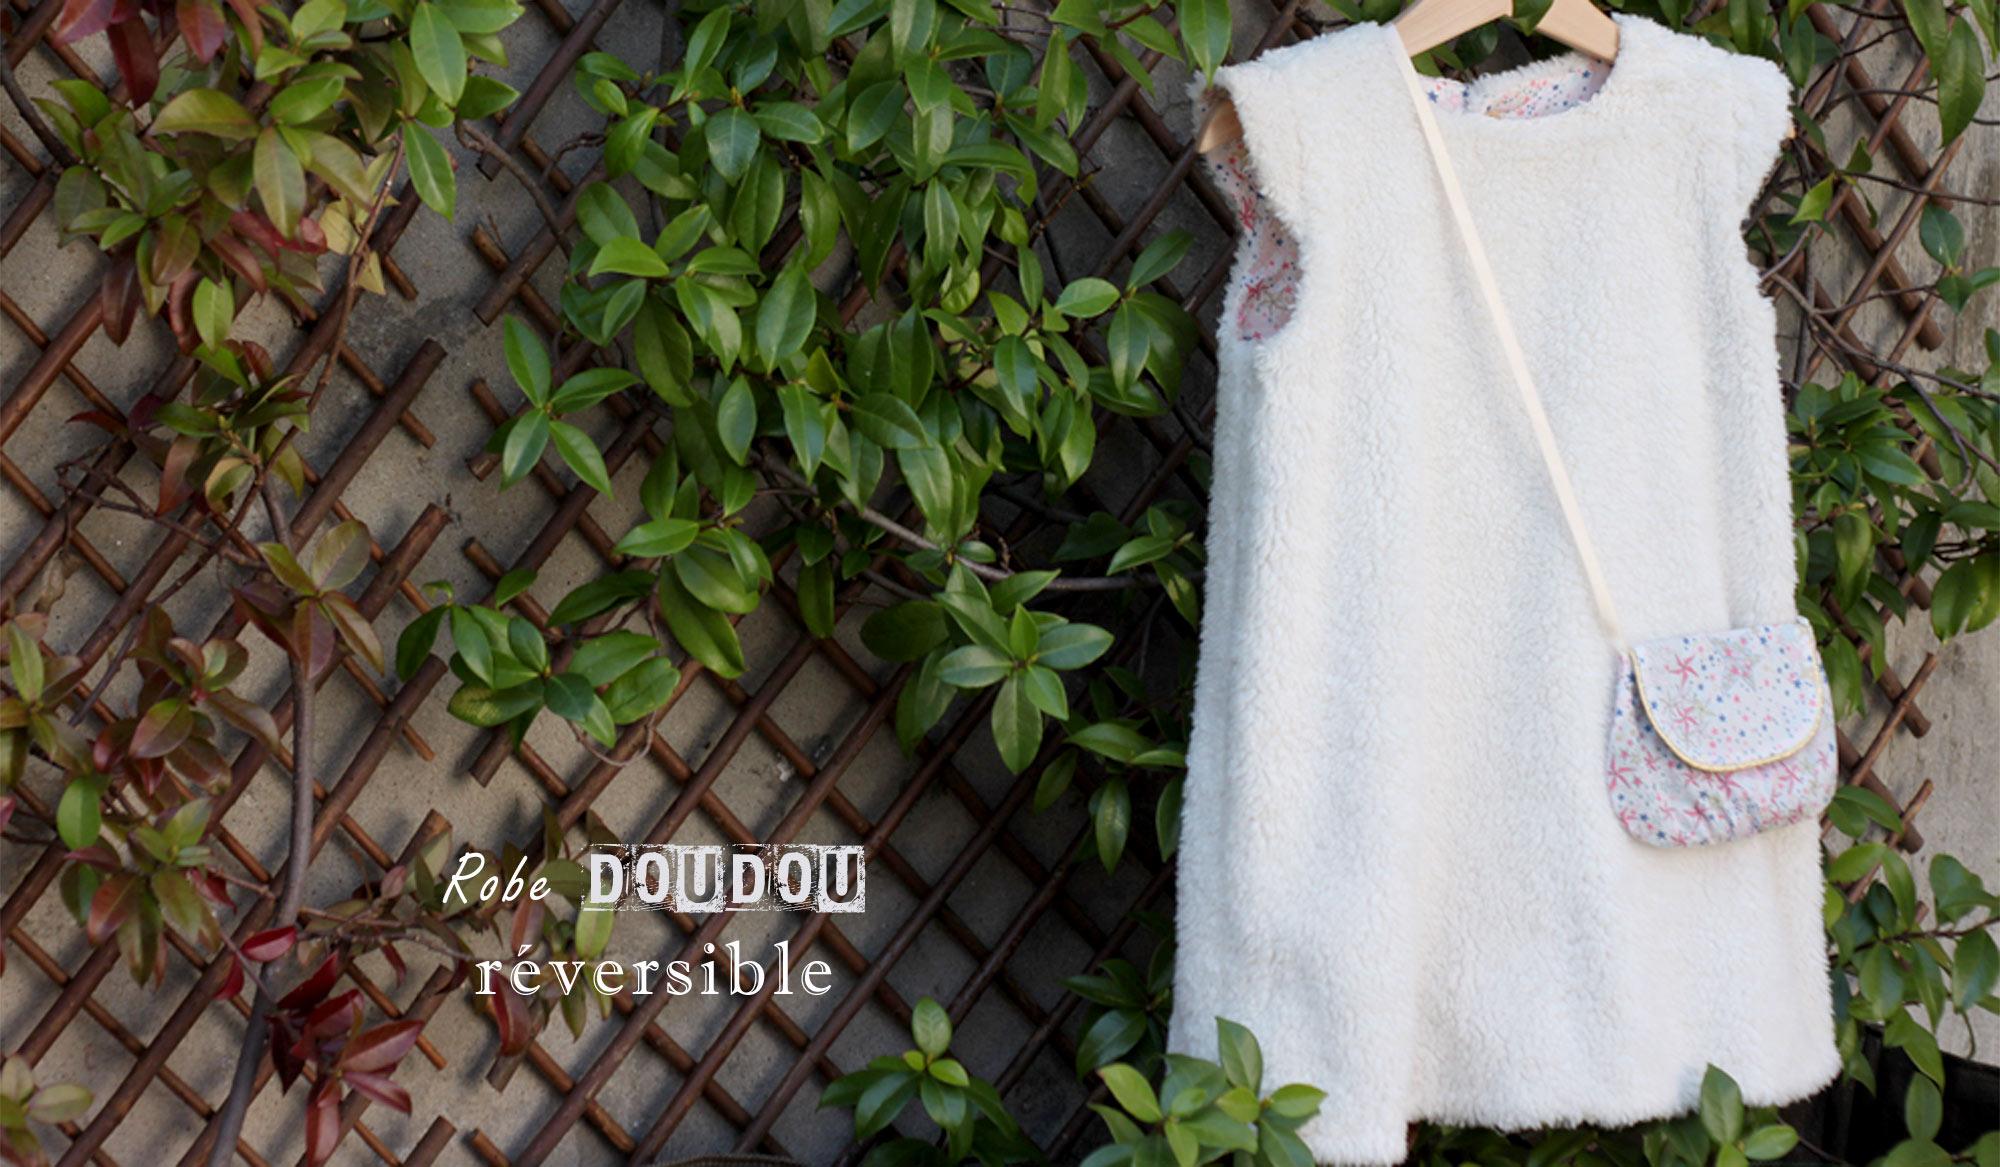 slider-patron-robe-doudou-atelier-scammit-little-fabrics